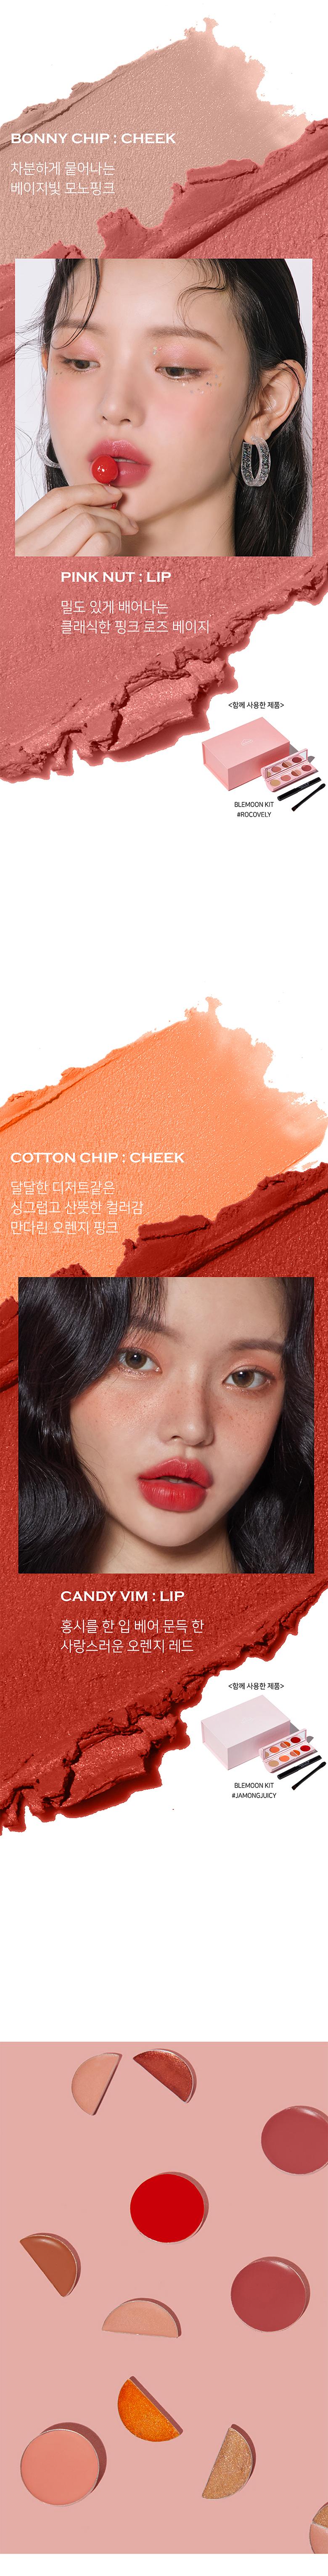 BLEMOON KIT CHEEK (COTTON CHIP (REFILE)) - 블레스문, 11,000원, 페이스메이크업, 블러셔